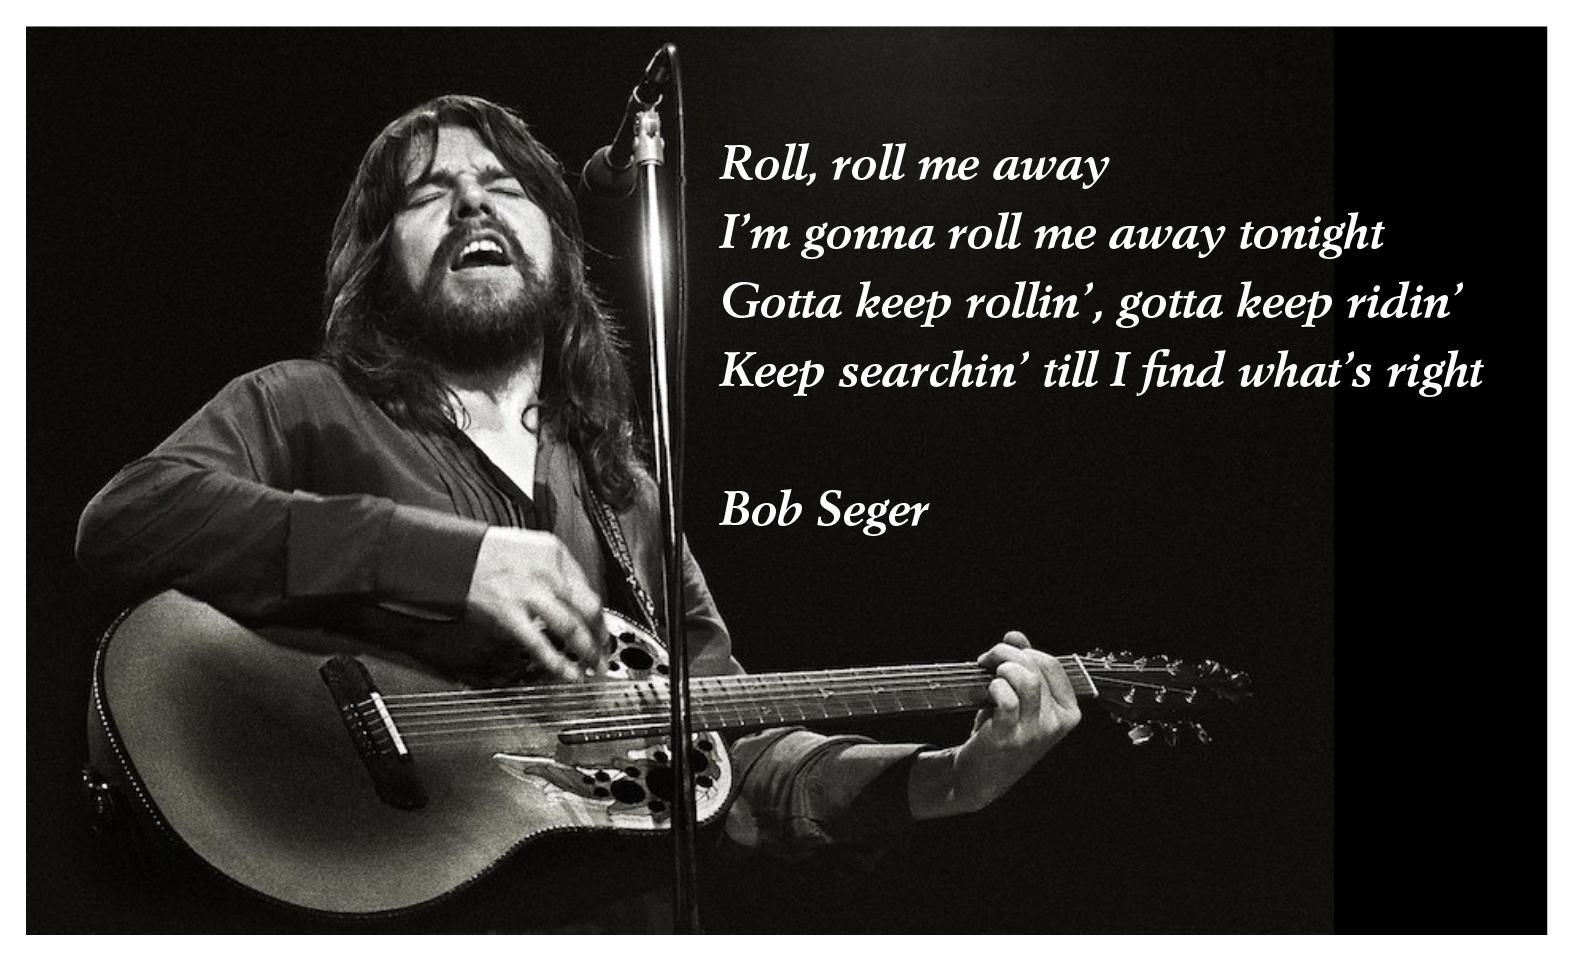 | Roll, roll me away  I'm gonna roll me away tonight Gotta keep rollin', gotta keep ridin' Keep searchin' till I find what's right  Bob Seger